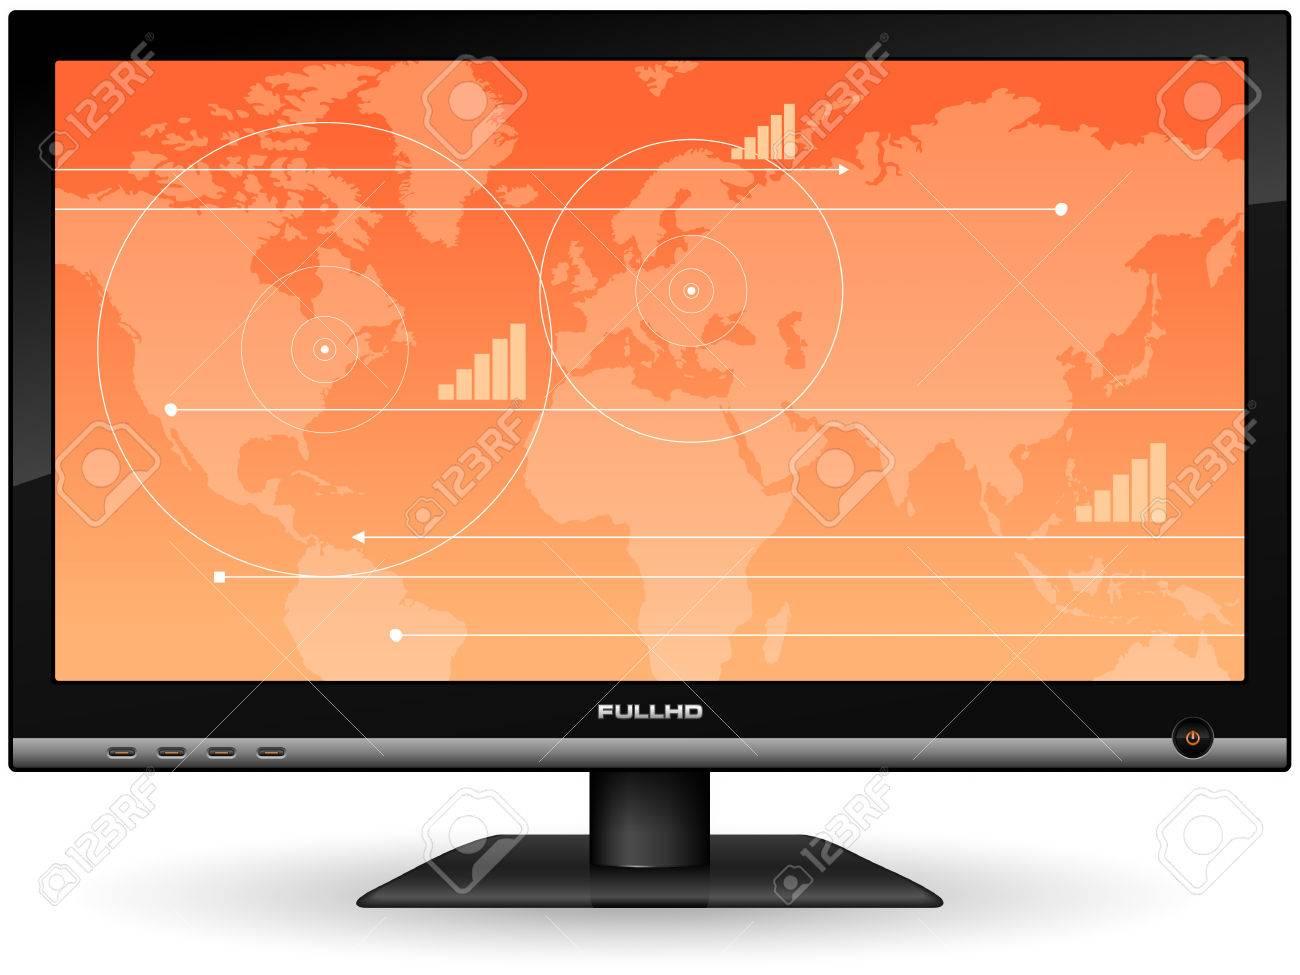 Plasma LCD TV Stock Vector - 6410907